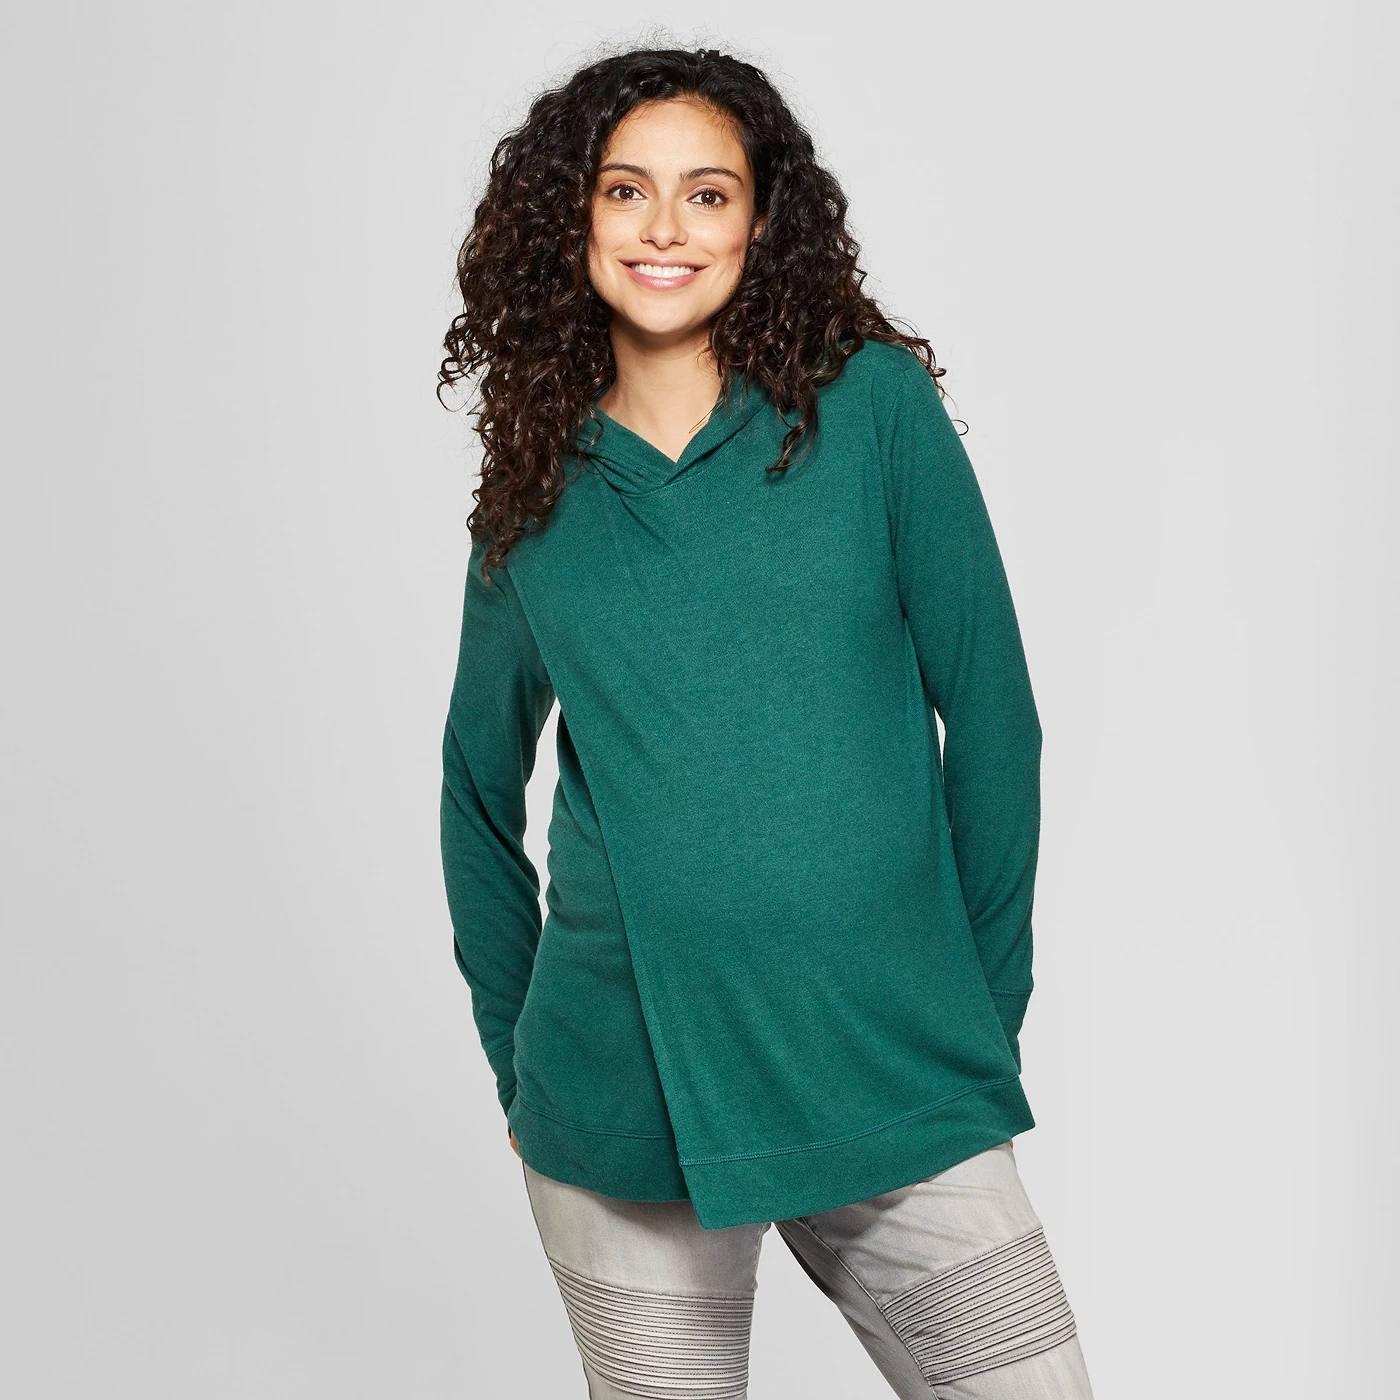 e530dcd849873 Long Sleeve Nursing Hooded Swing Sweatshirt by Ingrid & Isabel™. Courtesy  of Target